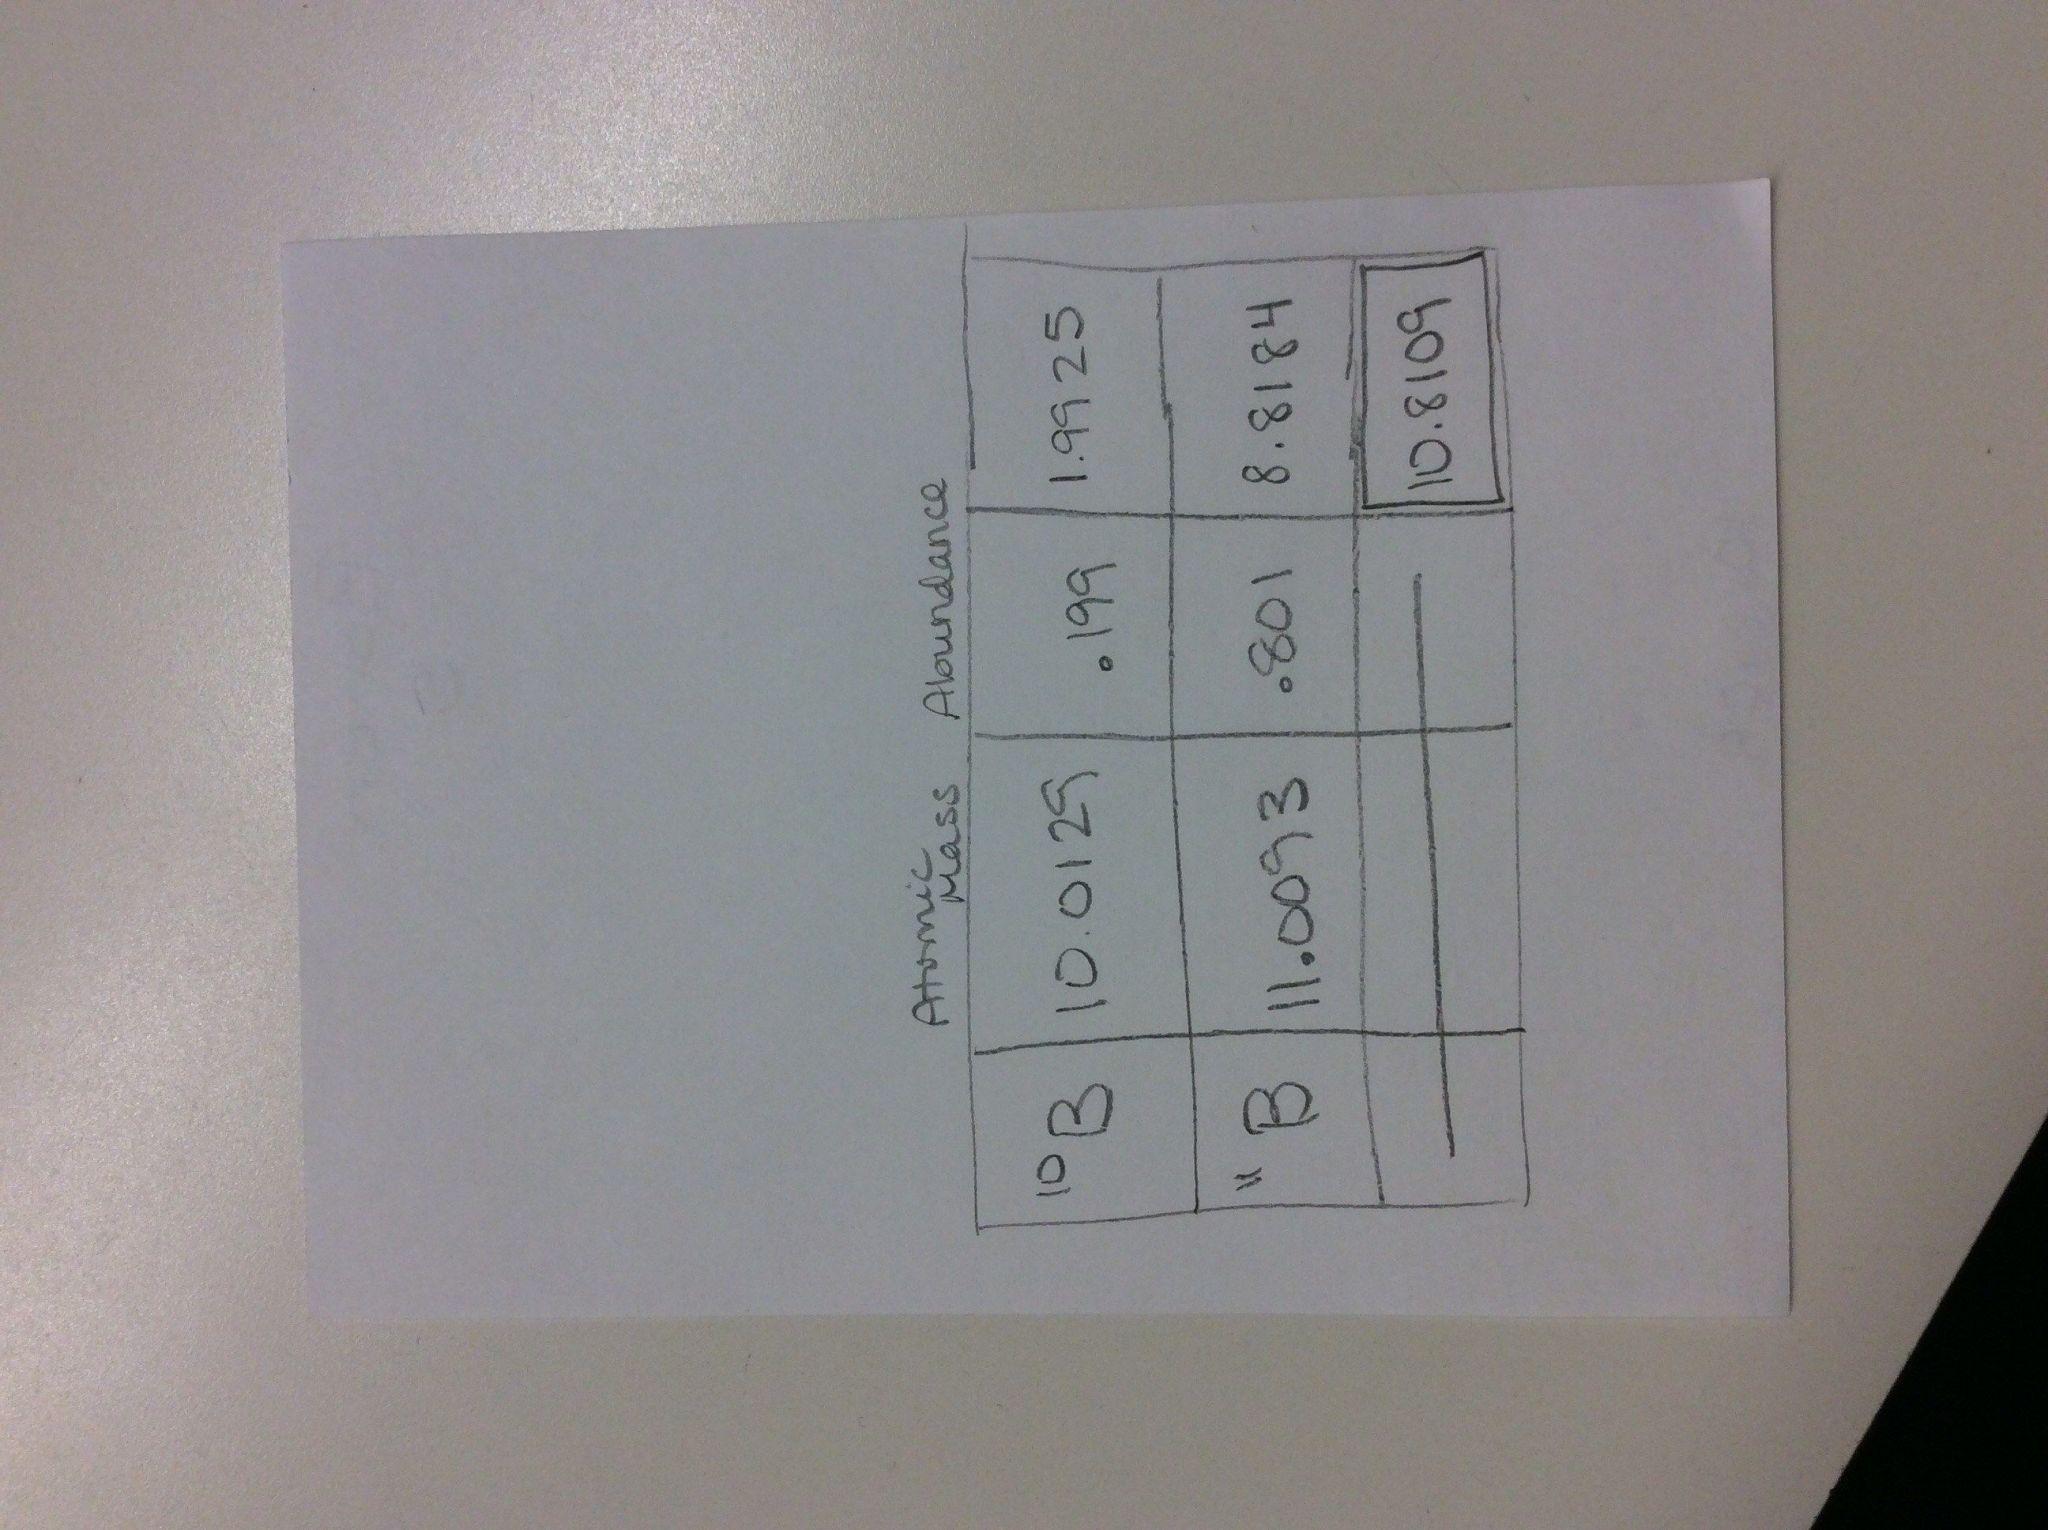 Chemistry Bonding Packet Worksheet 2 Reviewing Lewis Dot